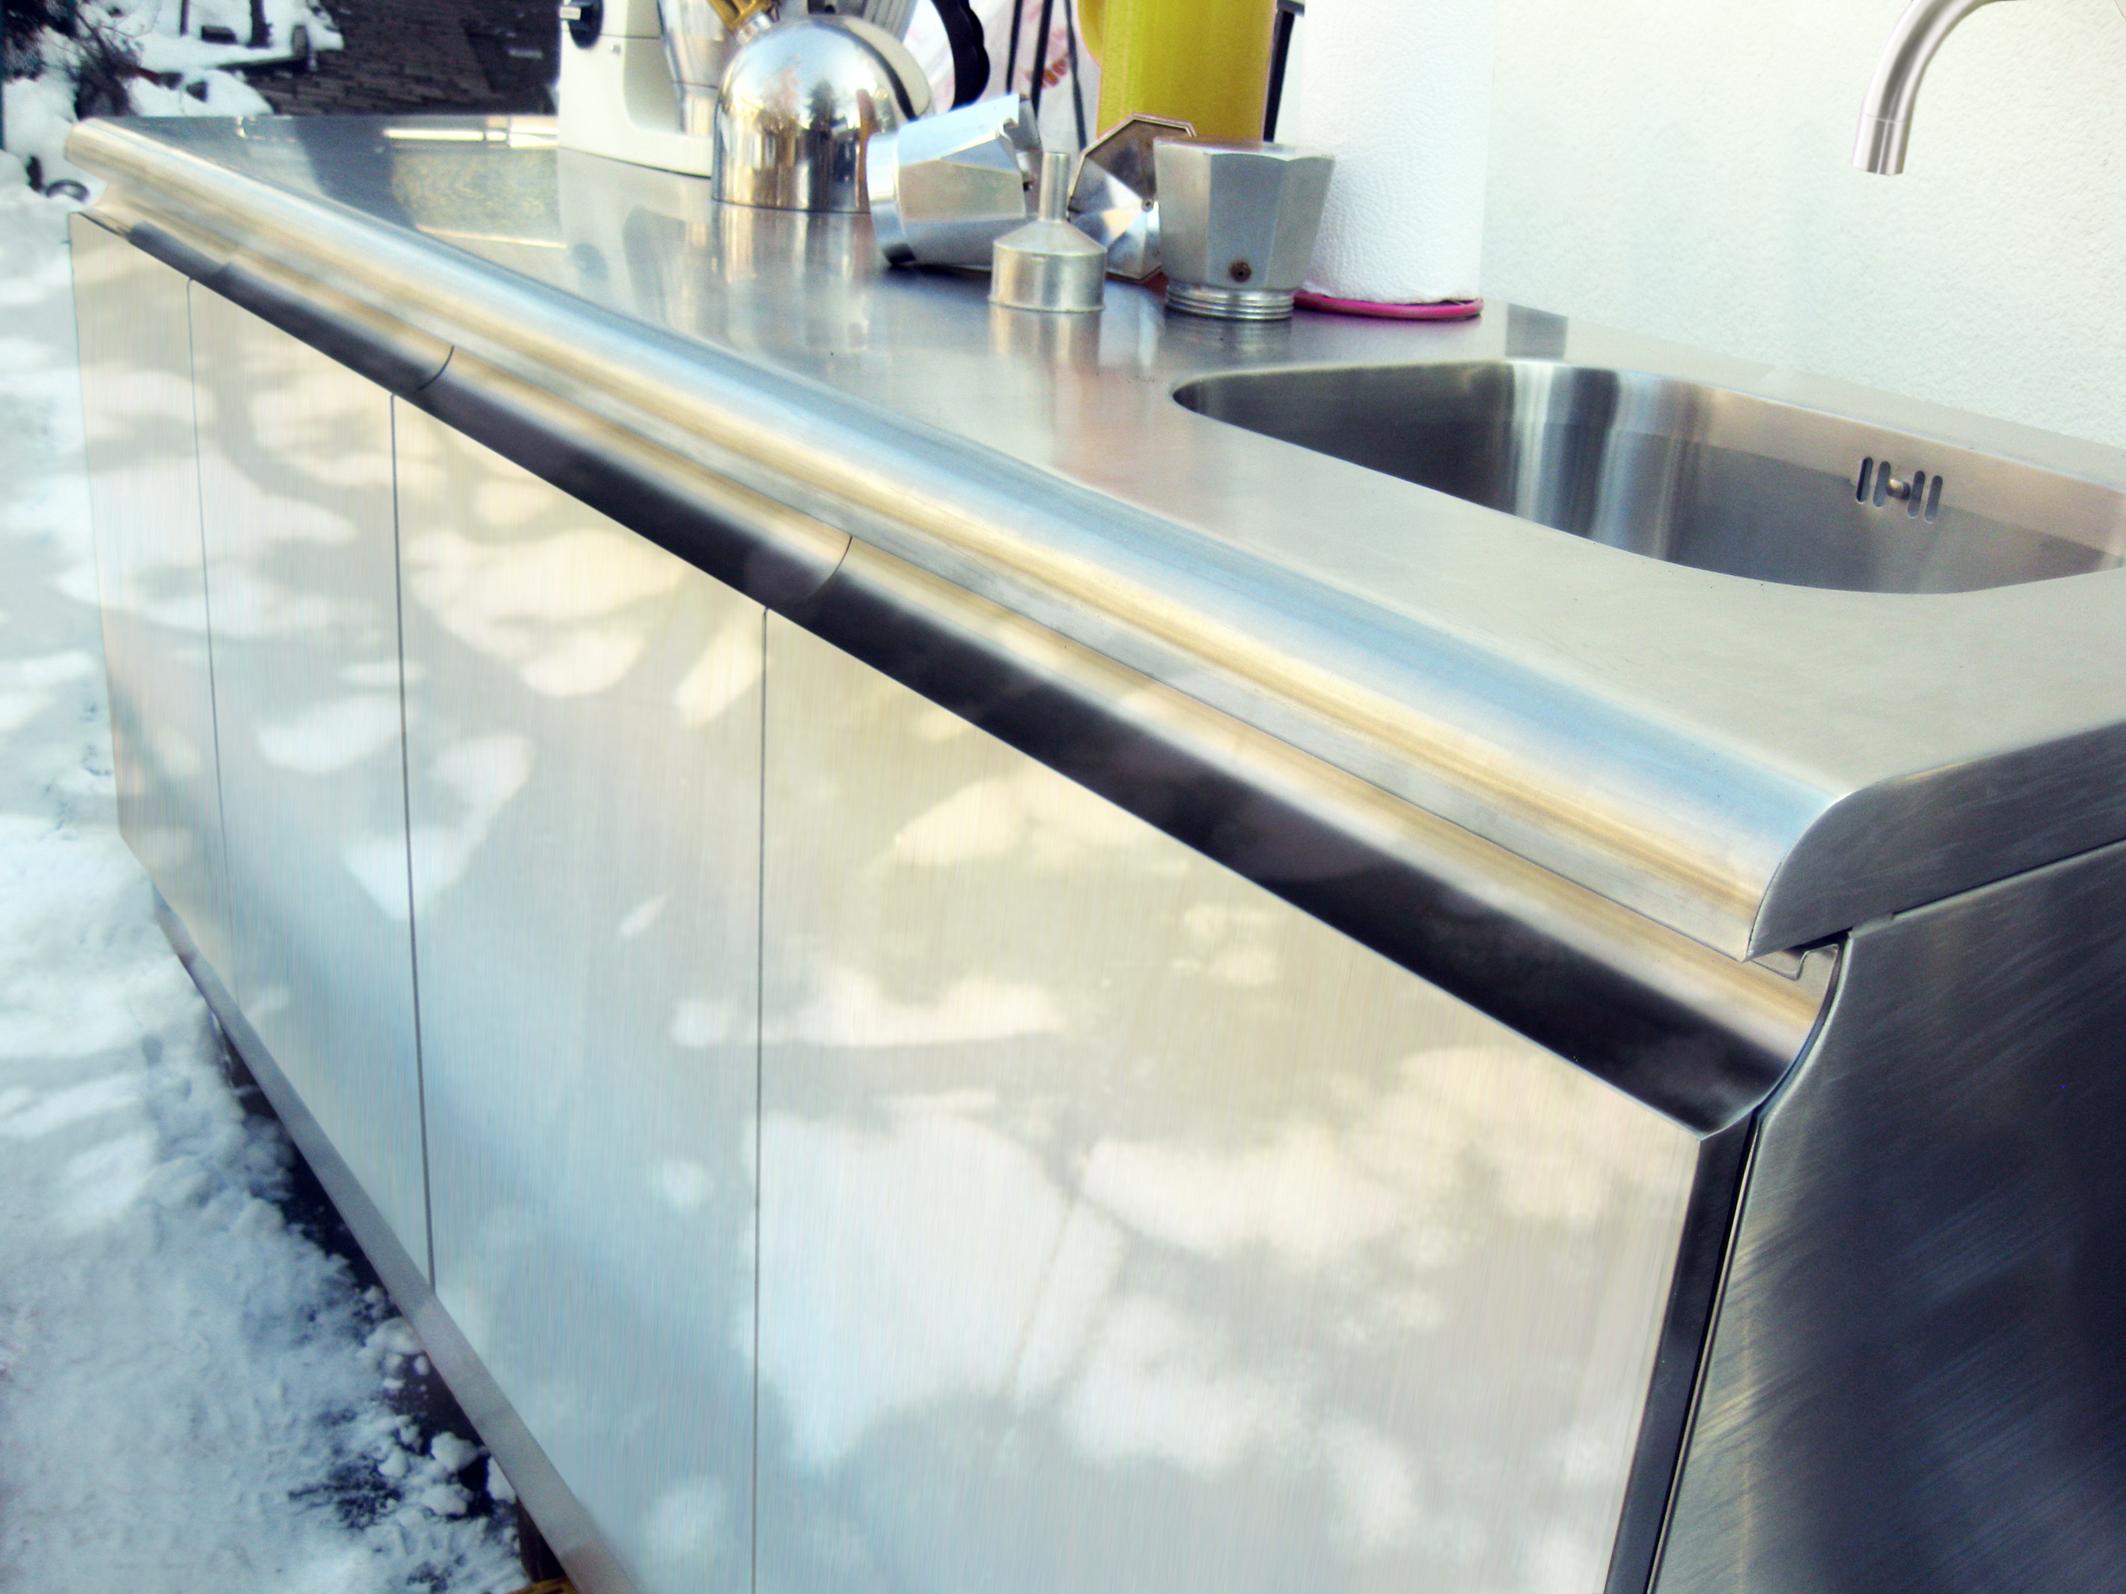 Outdoor Küchen Frammersbach : Datei linden linearkueche indoor outdoor kitchen g u wikipedia